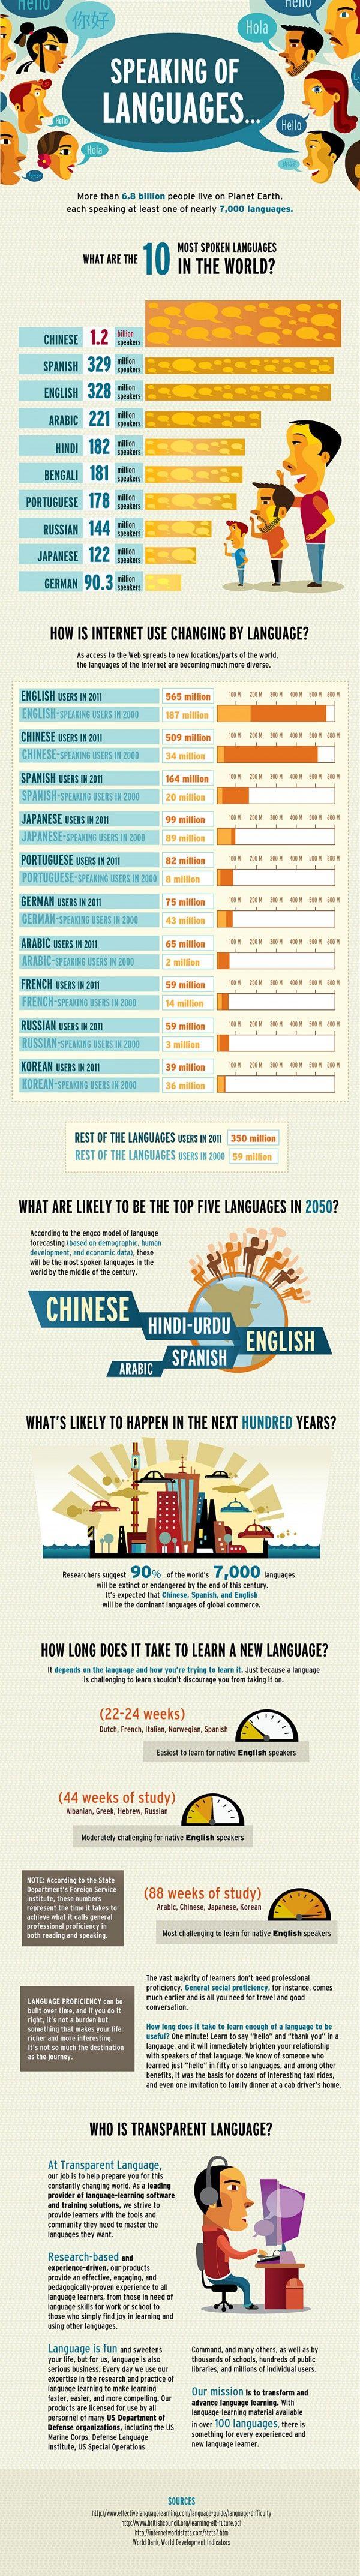 infographic-speaking-of-languages Internet Site, Foreign Language,  Website, Schools, Web Site, Spoken Languages, Languages Infographic, Learning, Speak Languages